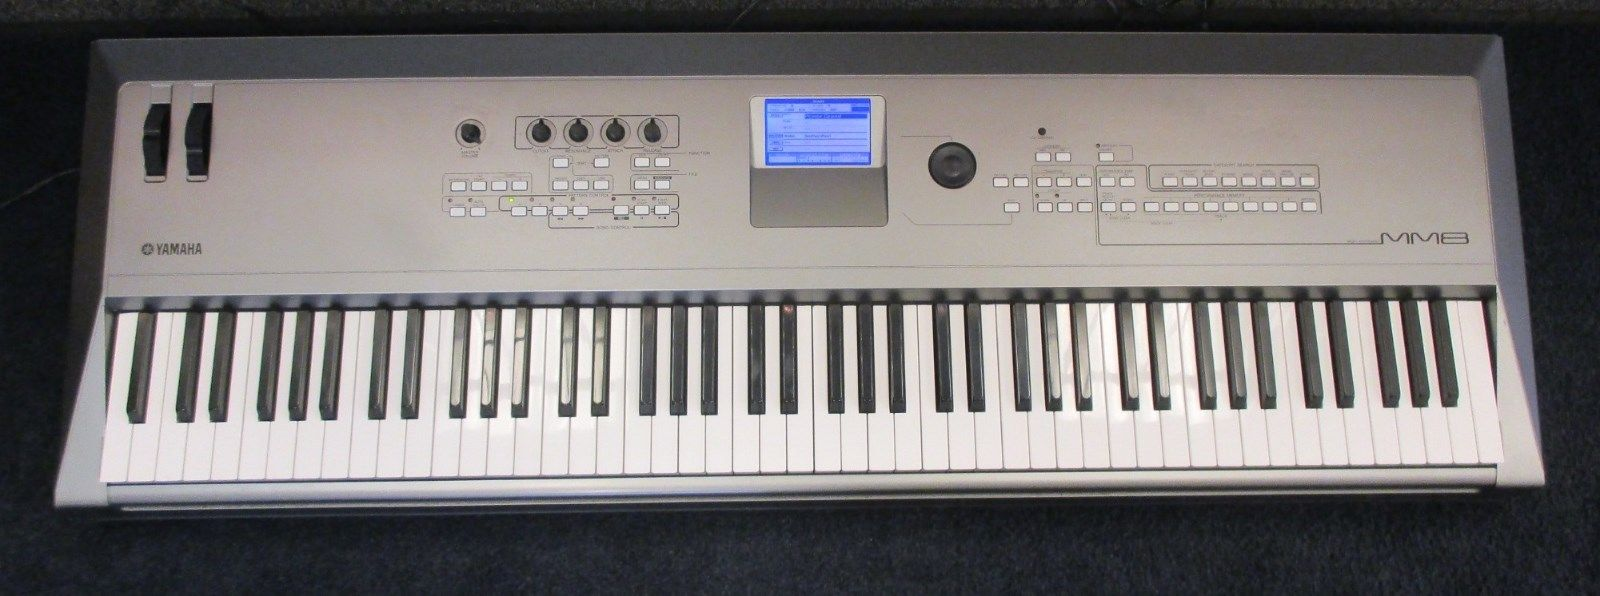 Yamaha 88 Key Keyboard For Sale Classifieds